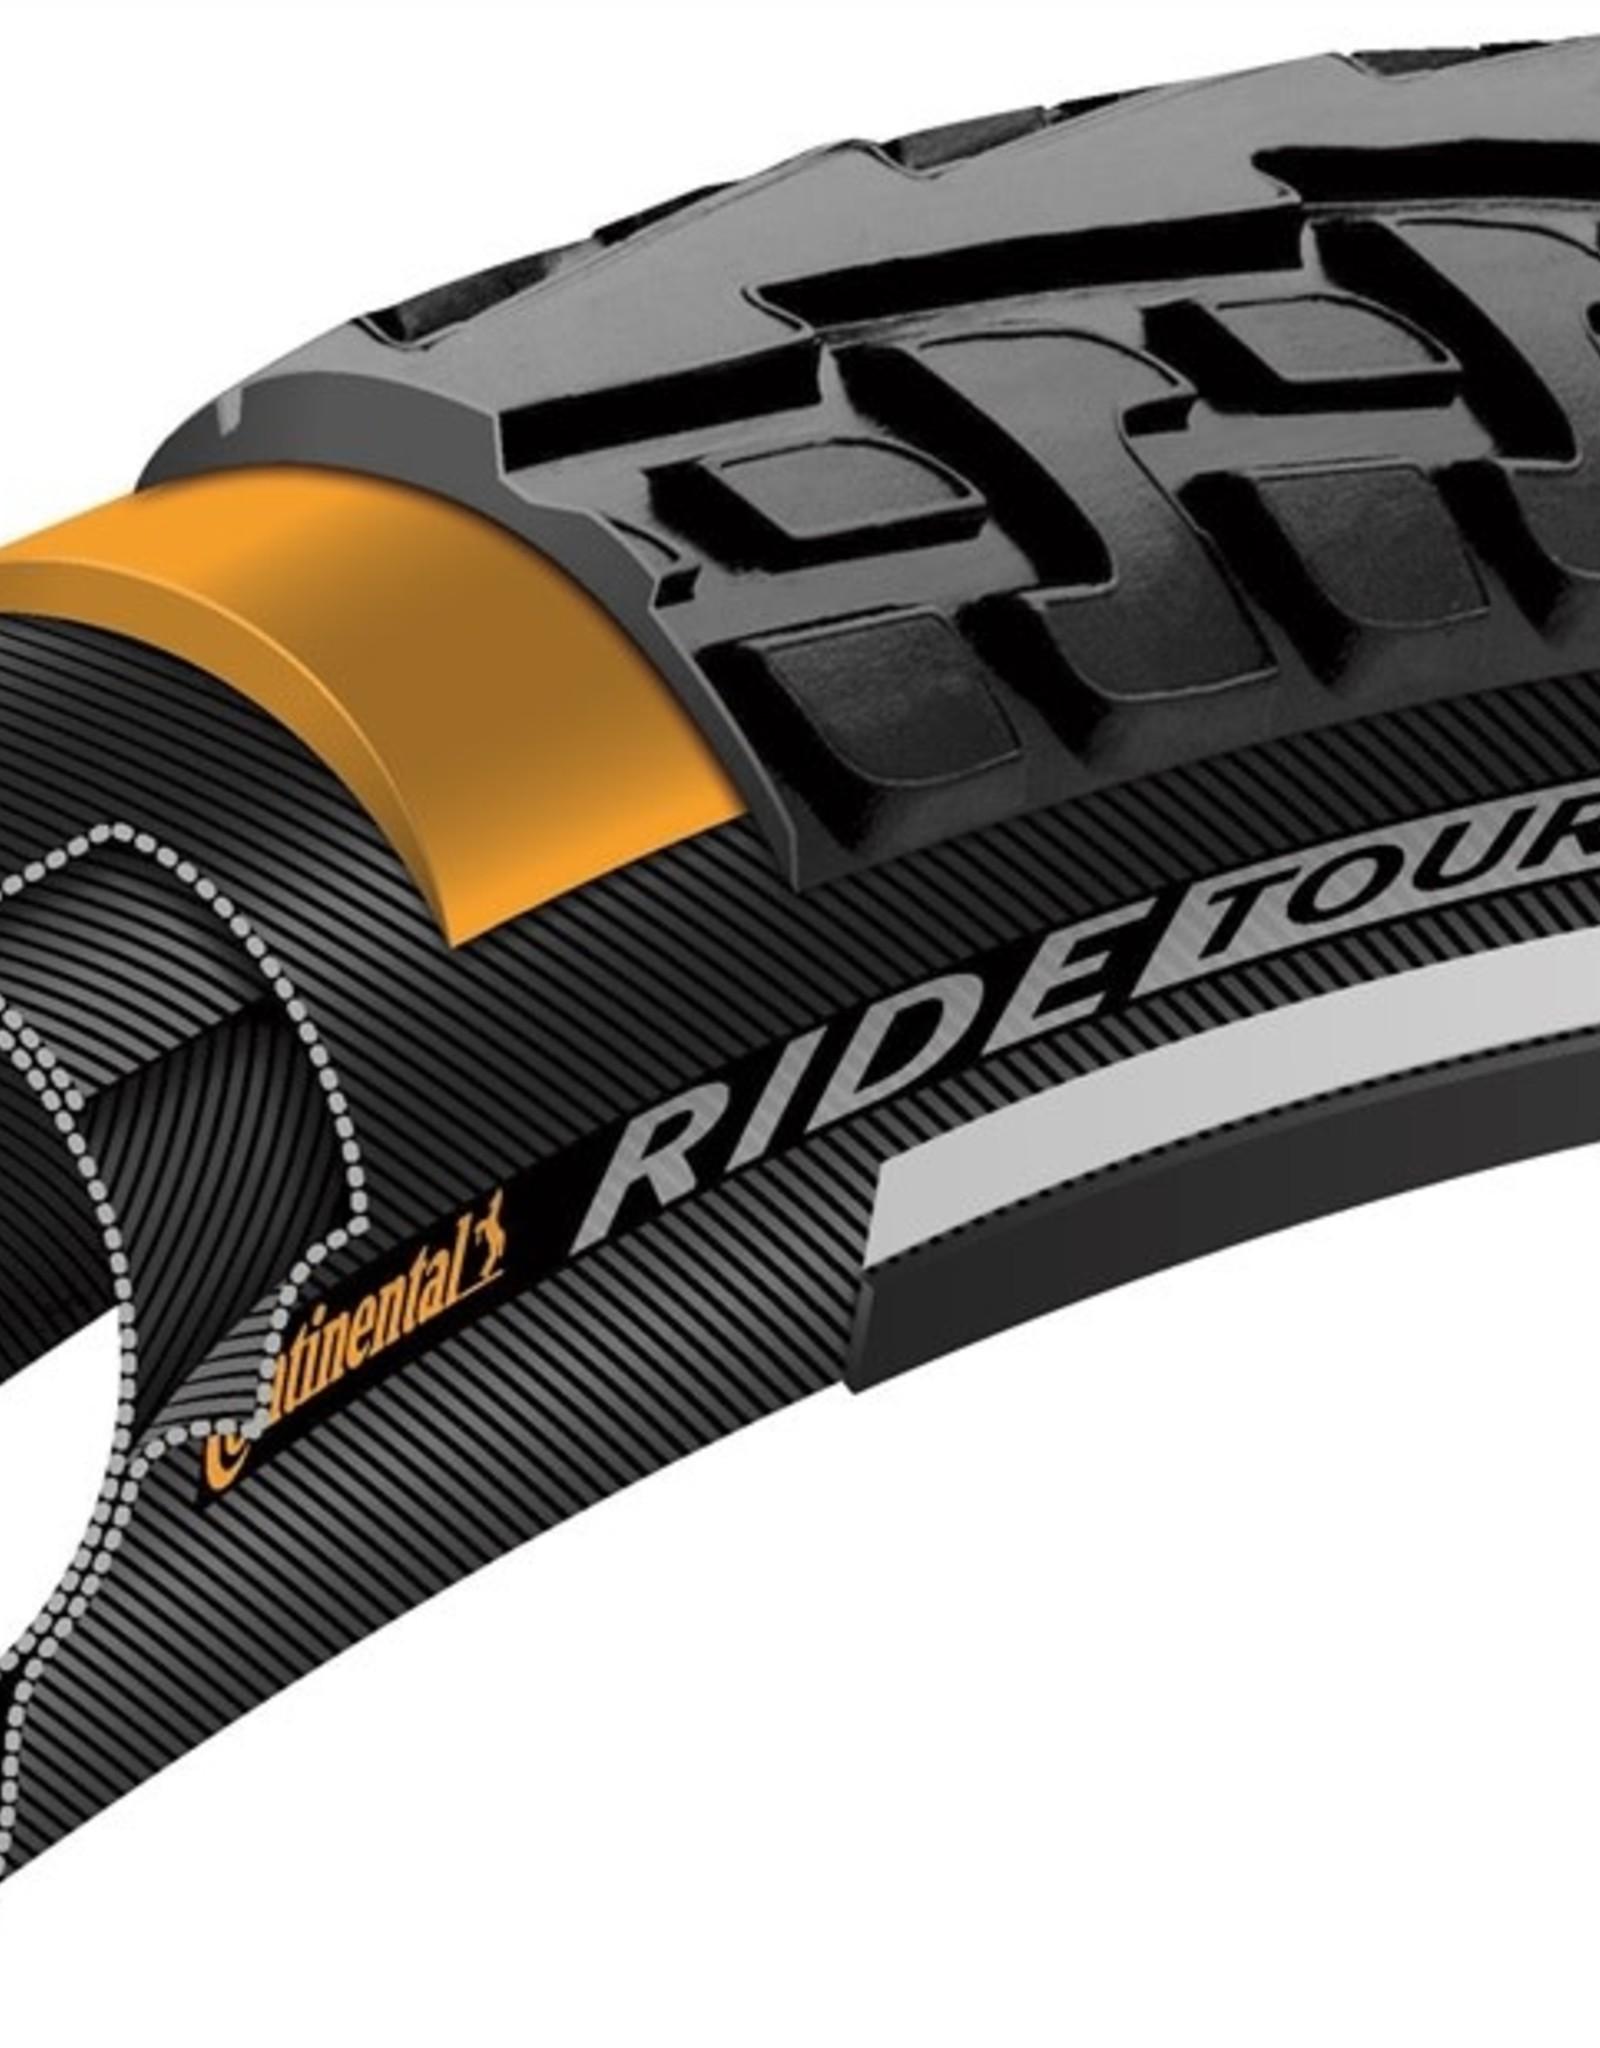 CONTINENTAL CONTINENTAL Tire RIDE TOUR 700 x 42c